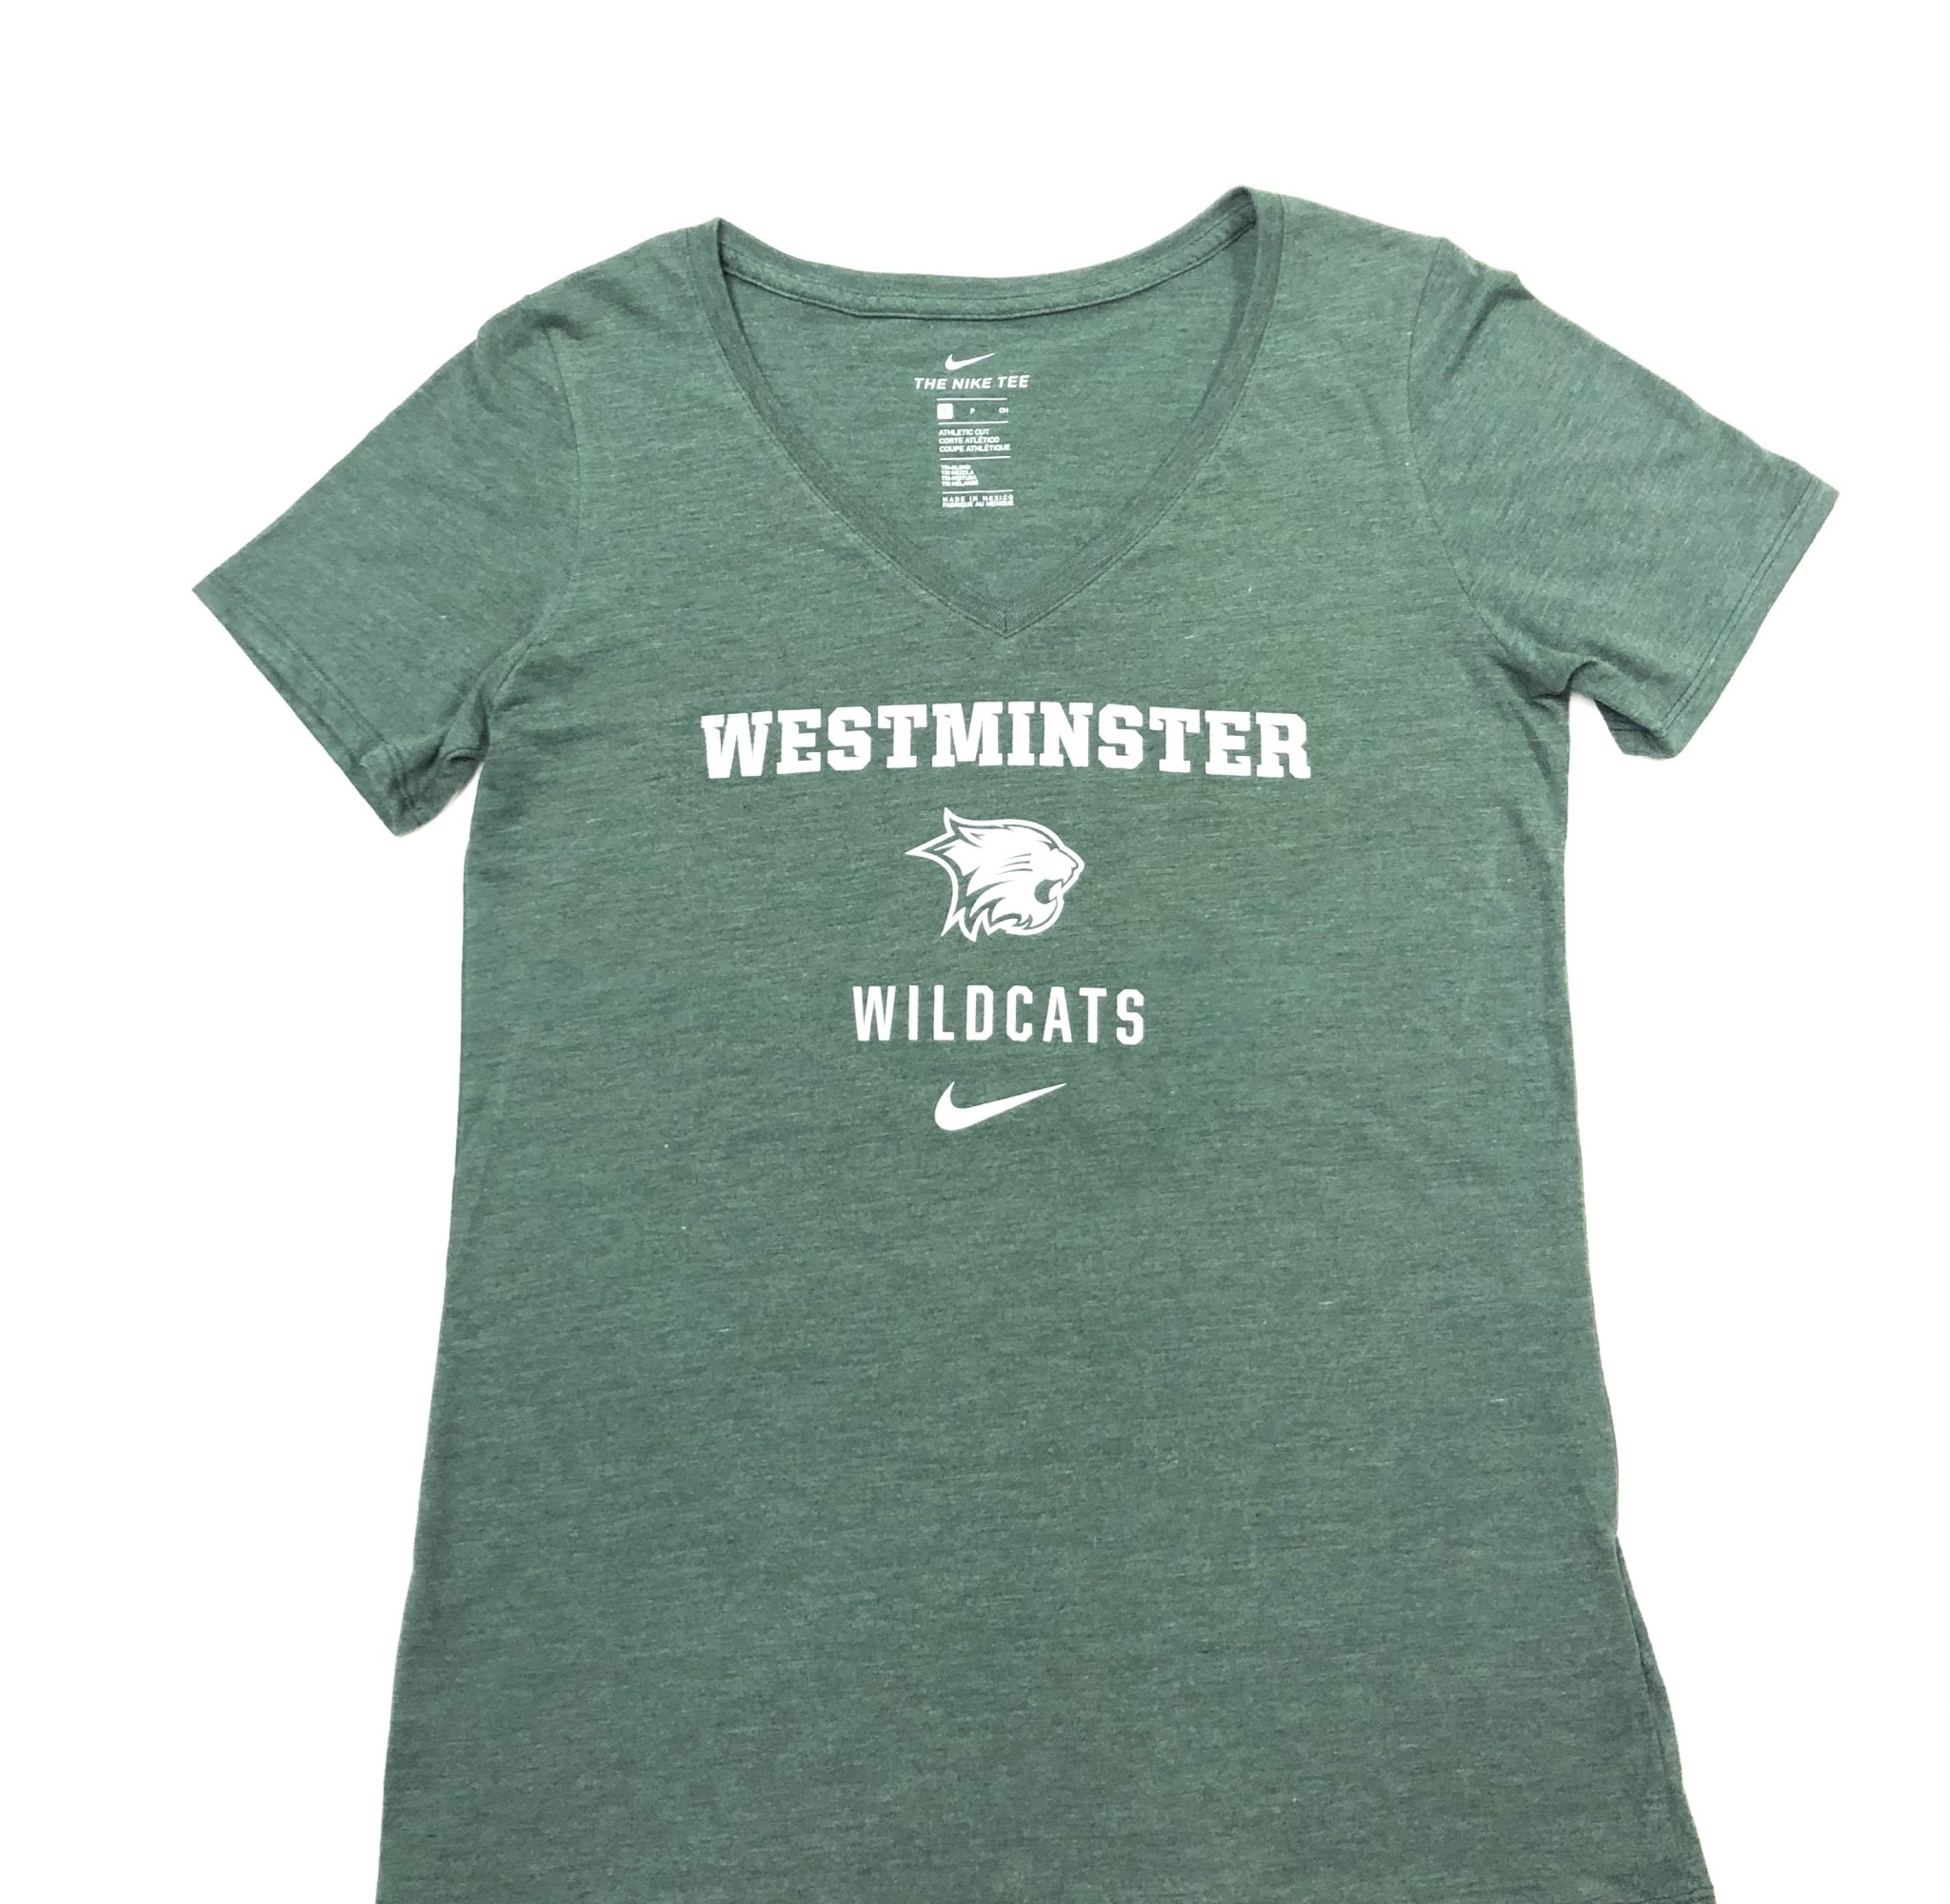 Nike T: Nike Women's Tri-blend Mid V- Heather Green w/ West Wildcats & Logo